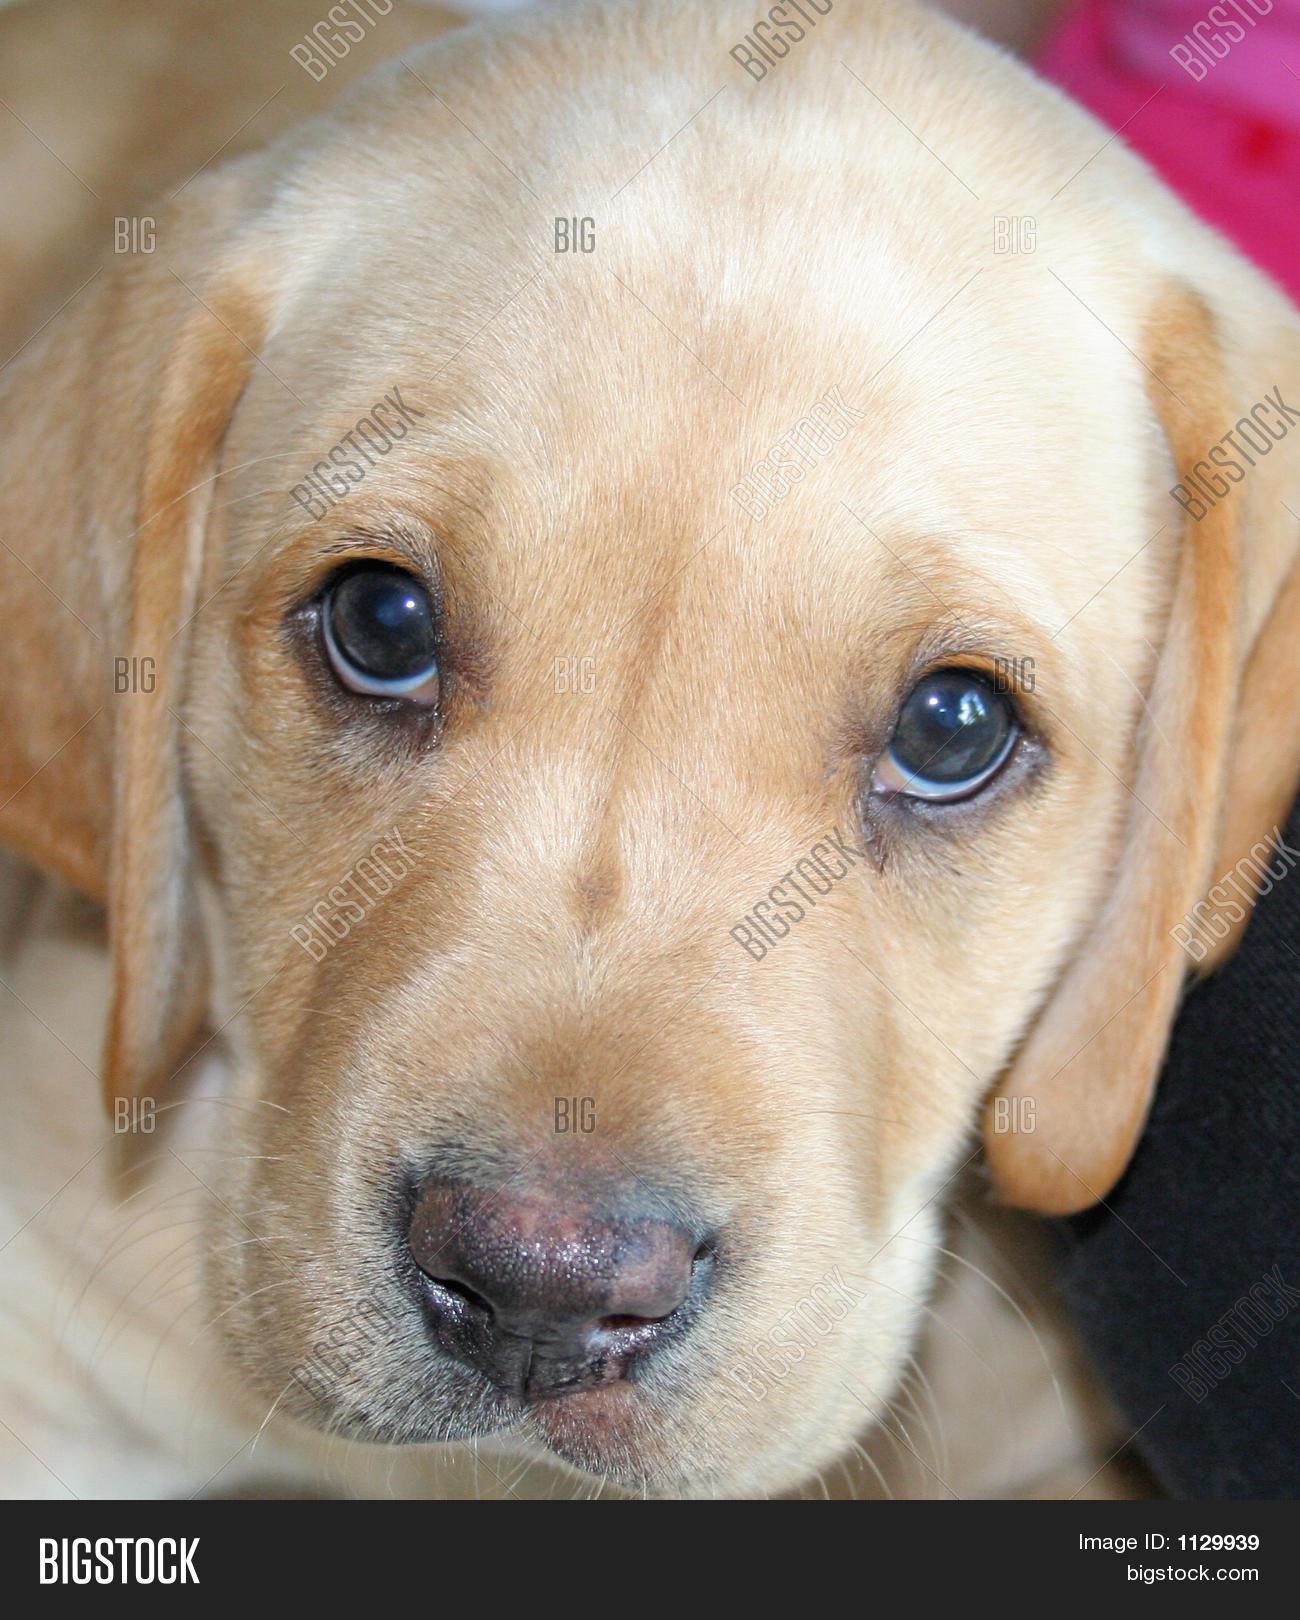 Sad Puppy Dog Eyes Image Photo Free Trial Bigstock